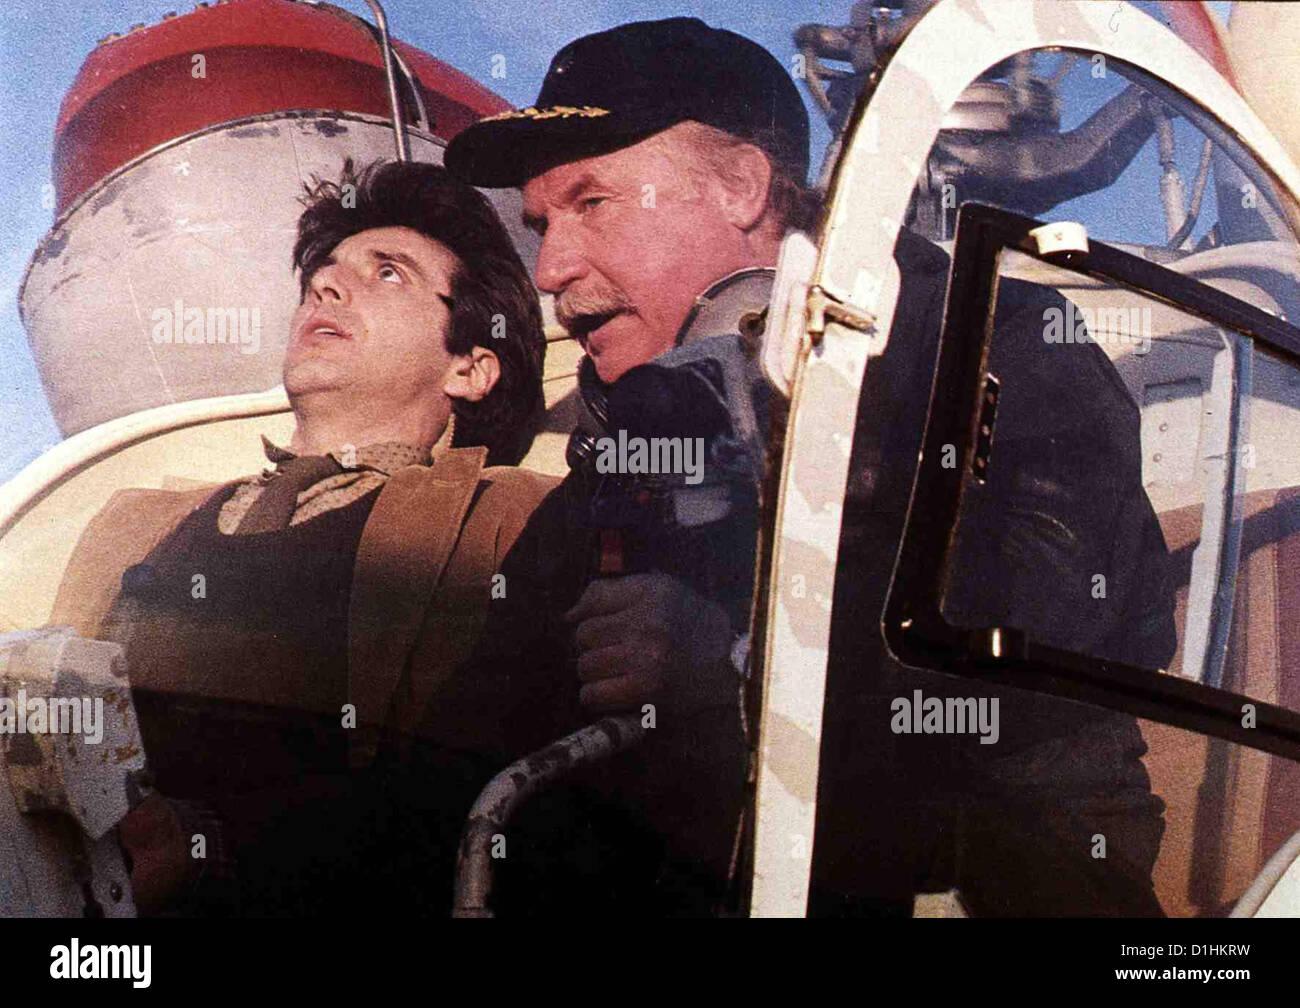 ... Gerechtigkeit für Alle Justice Tous Al Pacino, Jack Warden Kirklan (Al Pacino) hasst Fleming und den daher Photo Stock